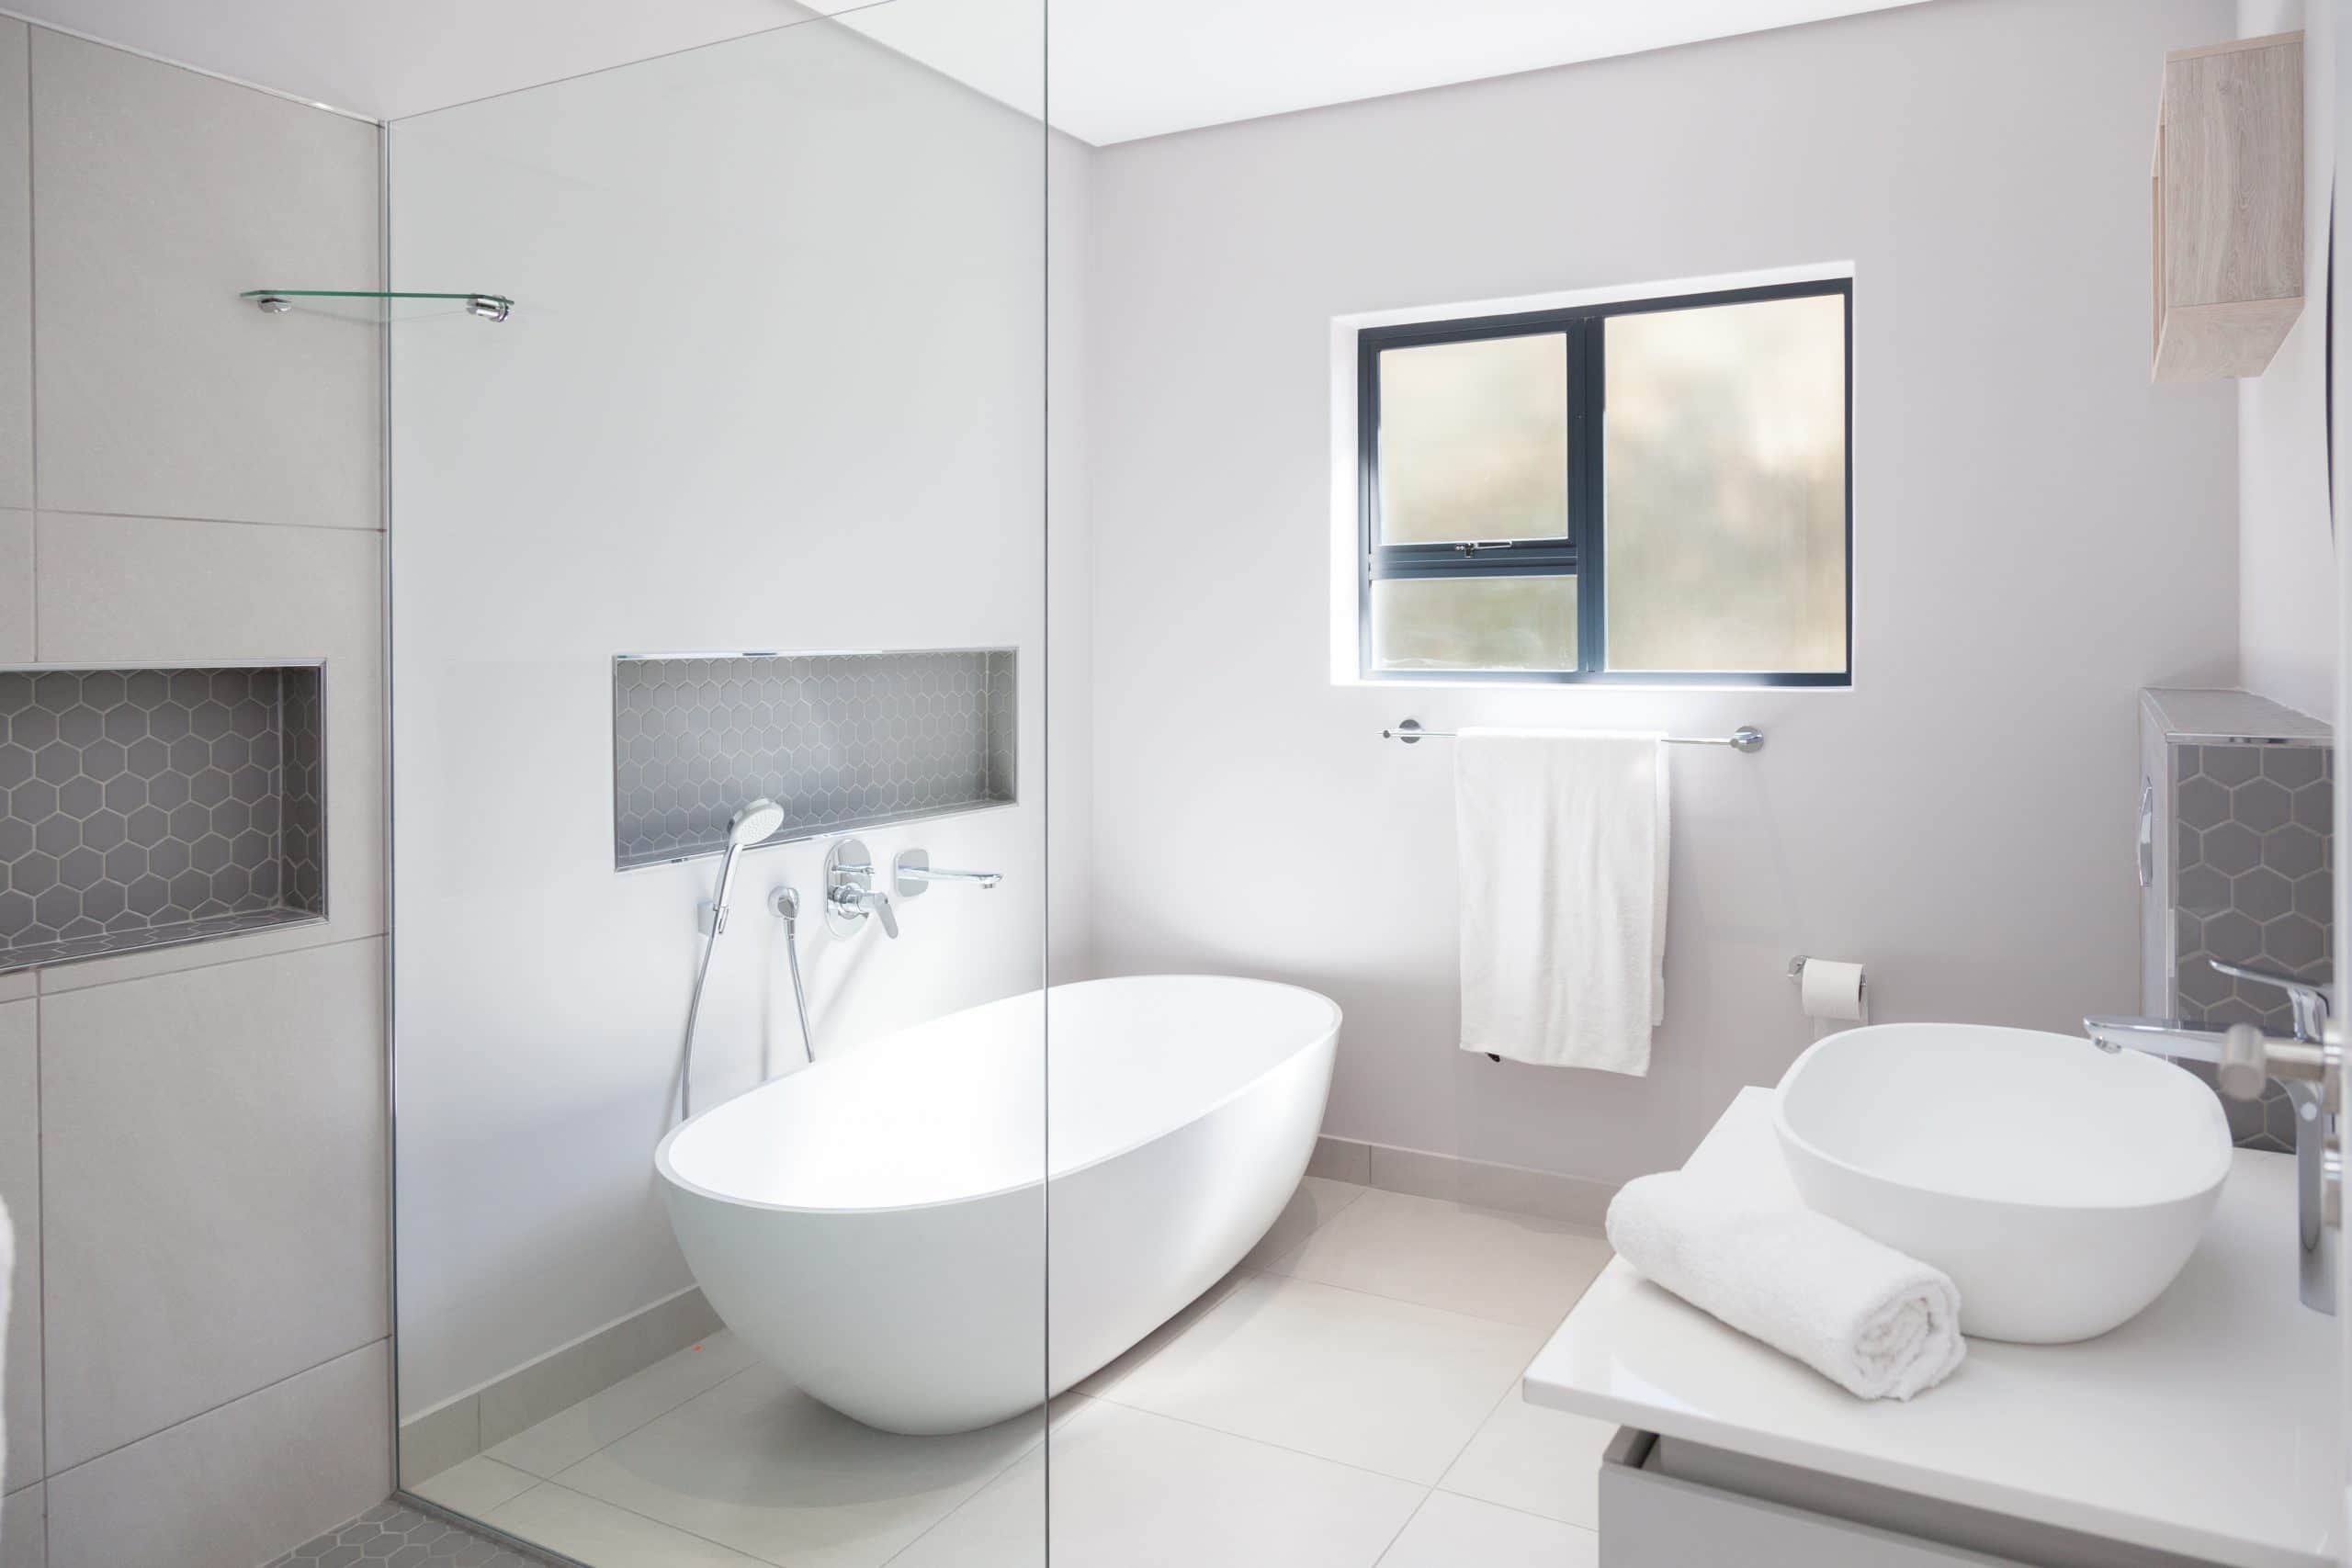 dado freestanding bath with open shower and modern bathroom